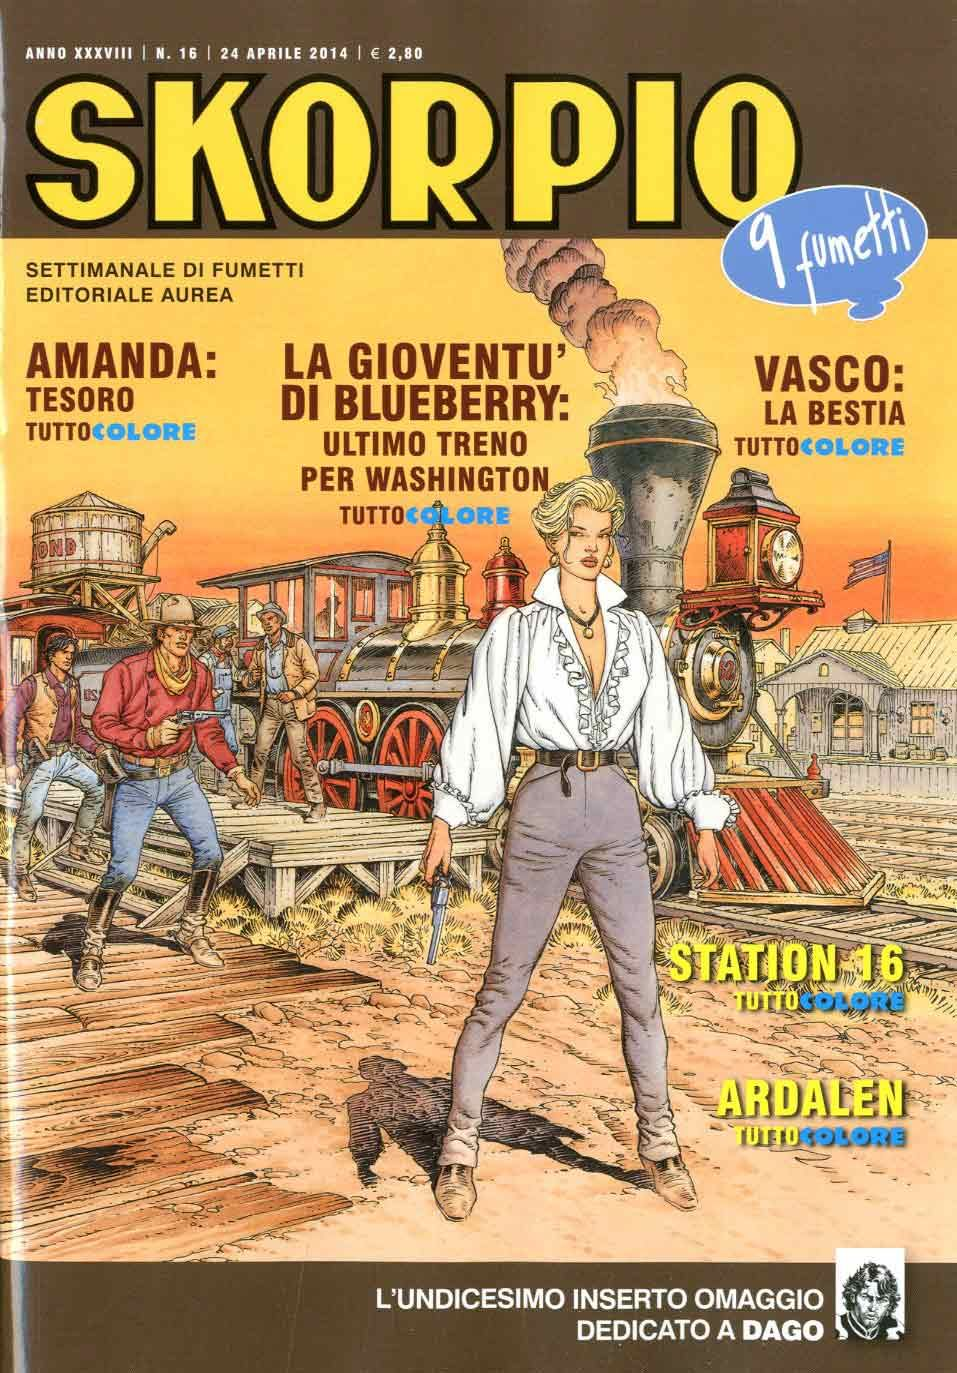 Fumetti EDITORIALE AUREA, Collana SKORPIO ANNEE 38 - 201416